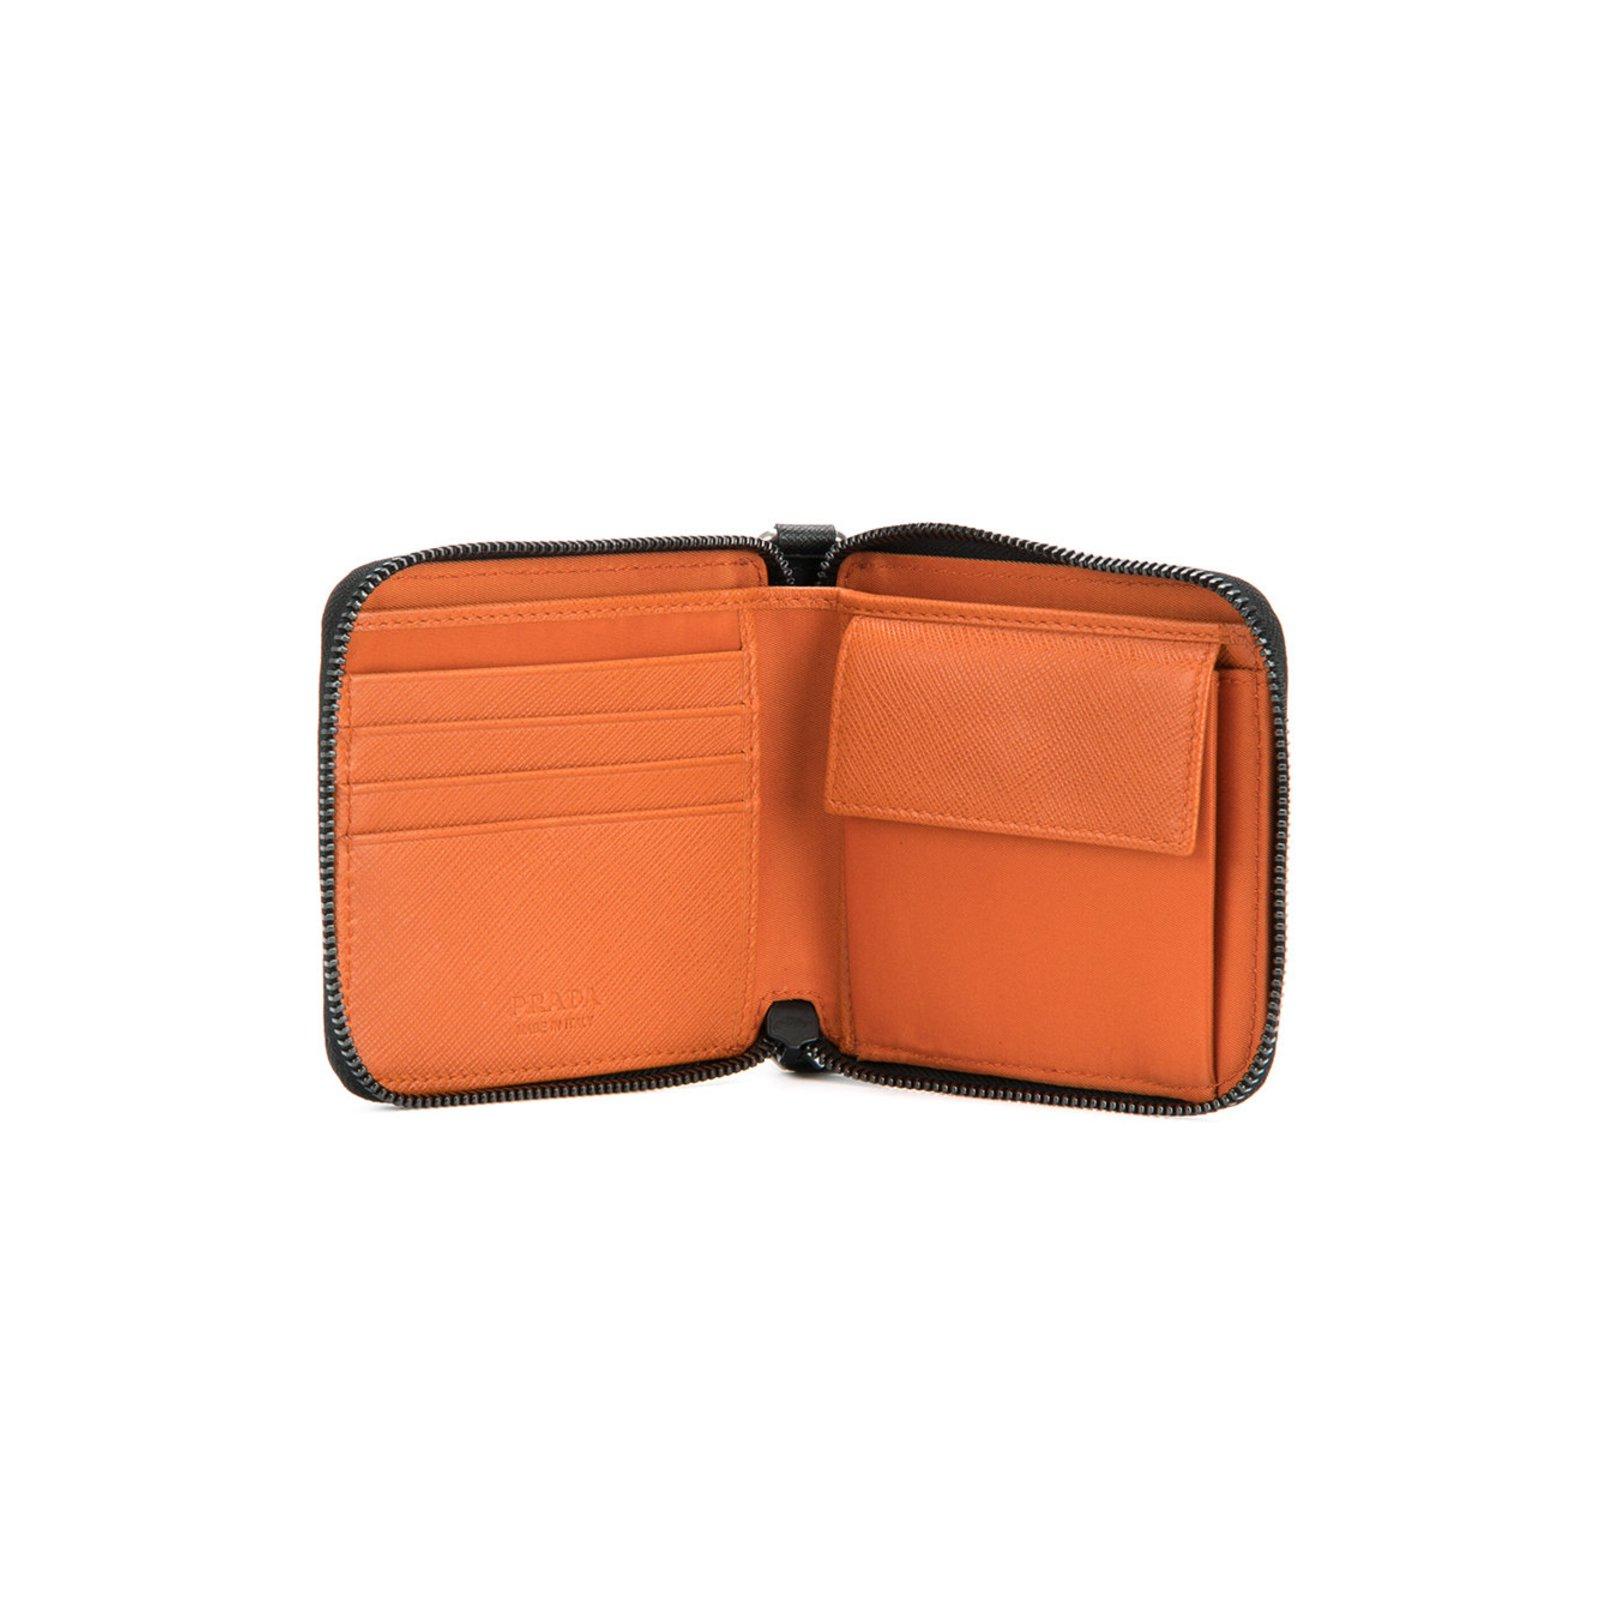 42507922c40c Prada wallet Wallets Small accessories Other Black ref.72657 - Joli Closet